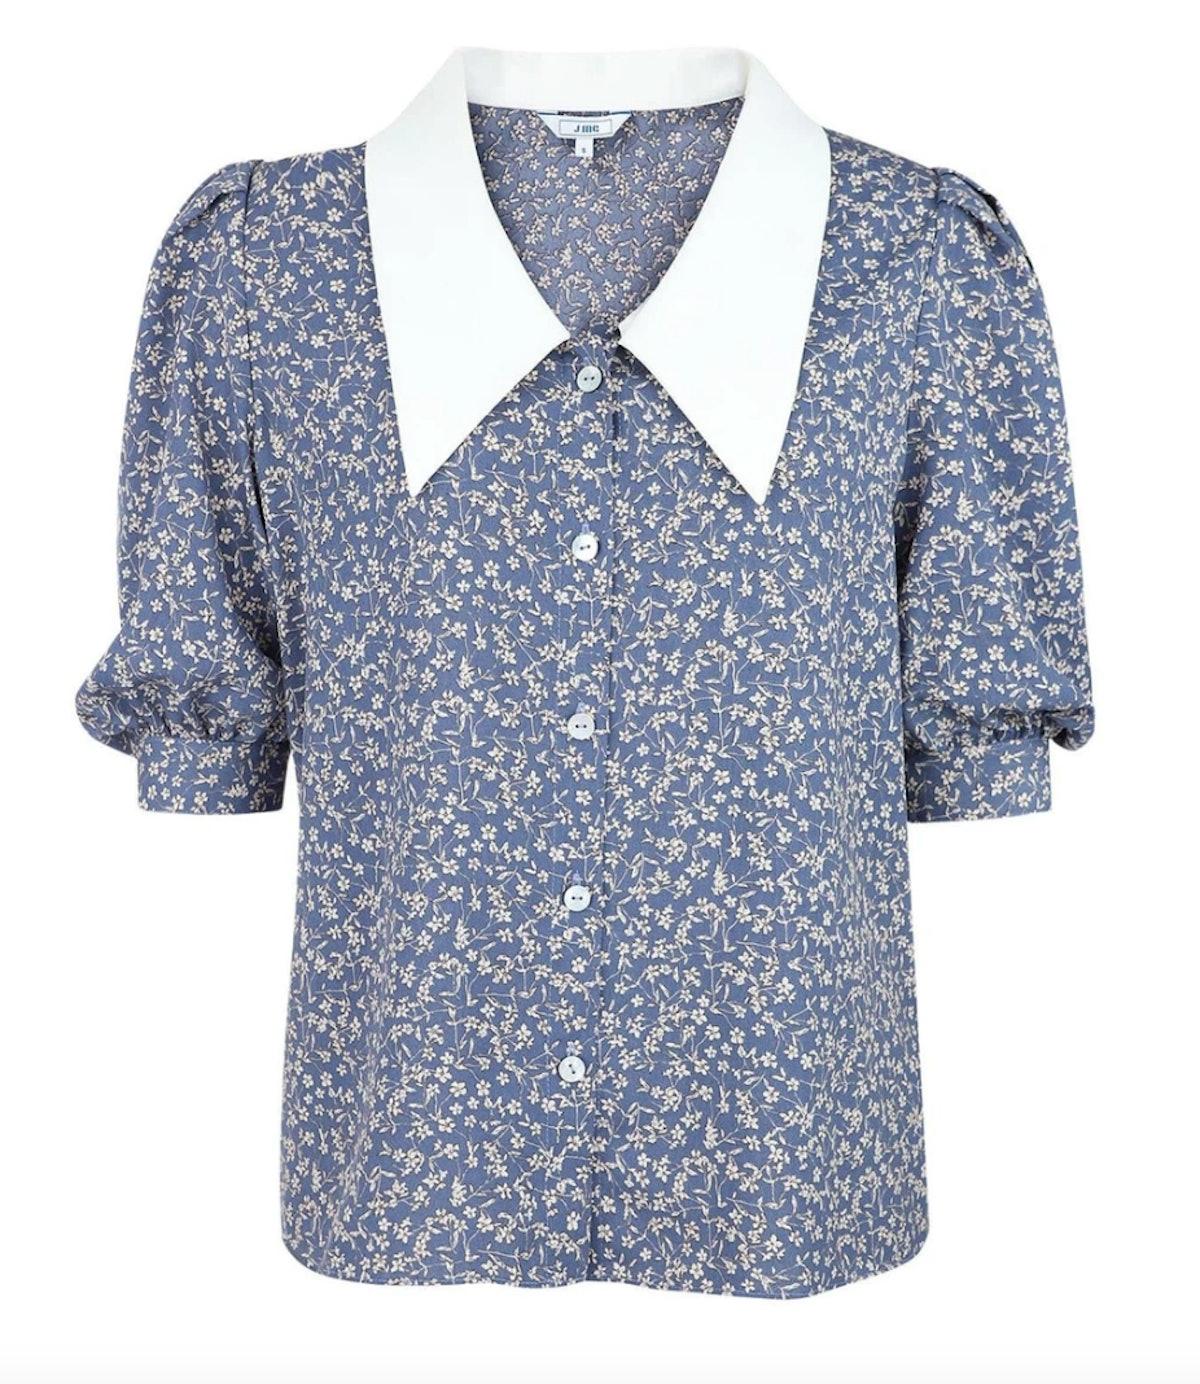 J.ING's Wellesley Floral Collar Blouse.